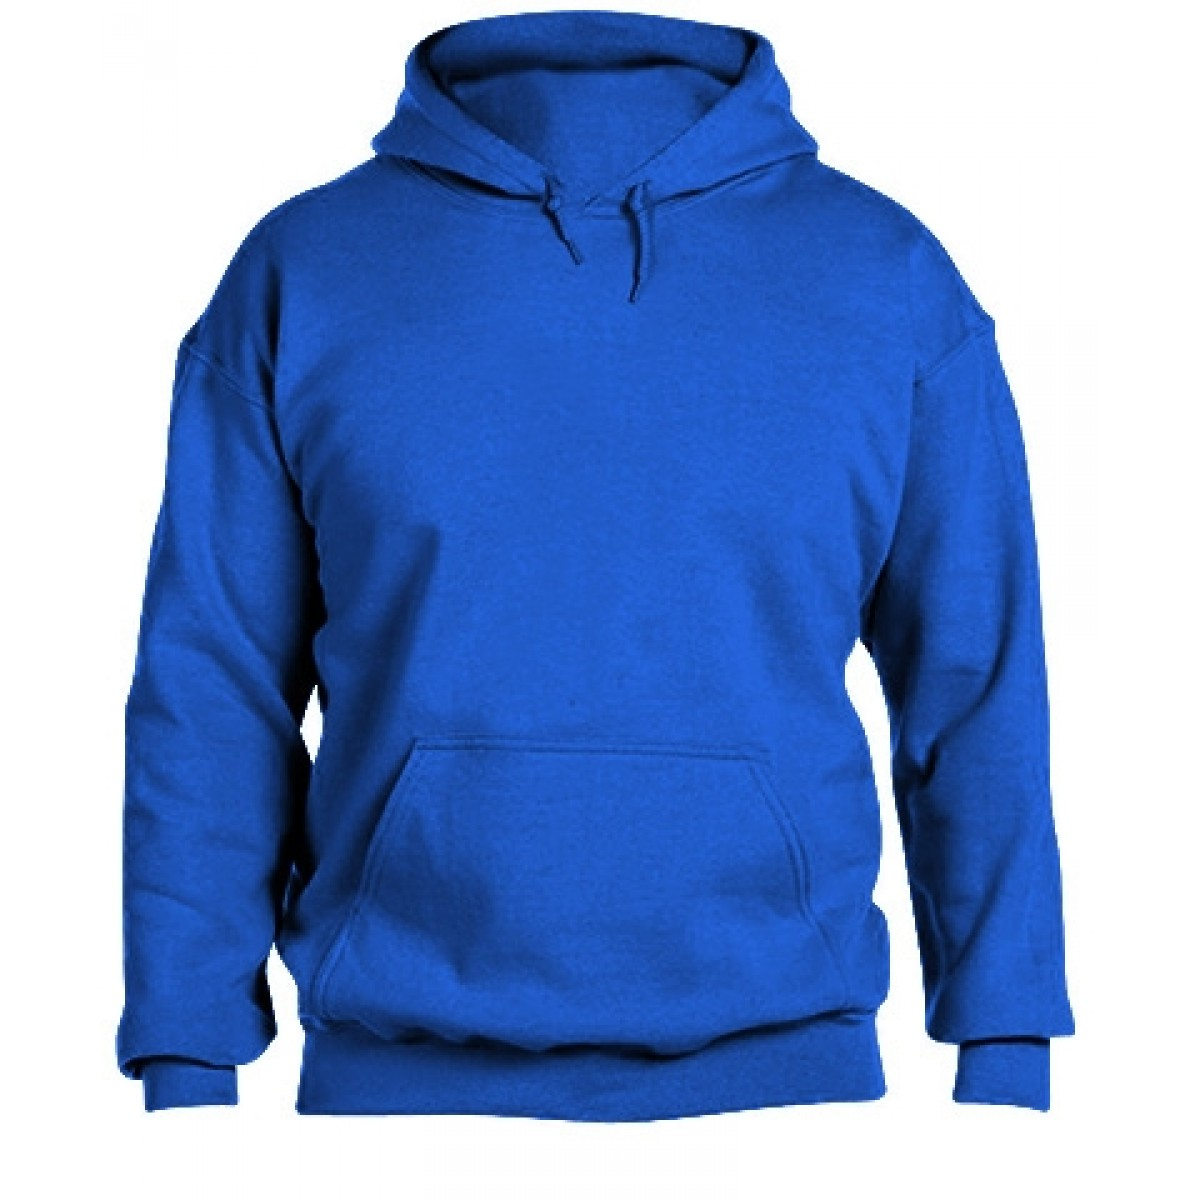 Solid Hooded Sweatshirt  50/50 Heavy Blend-Royal Blue-S